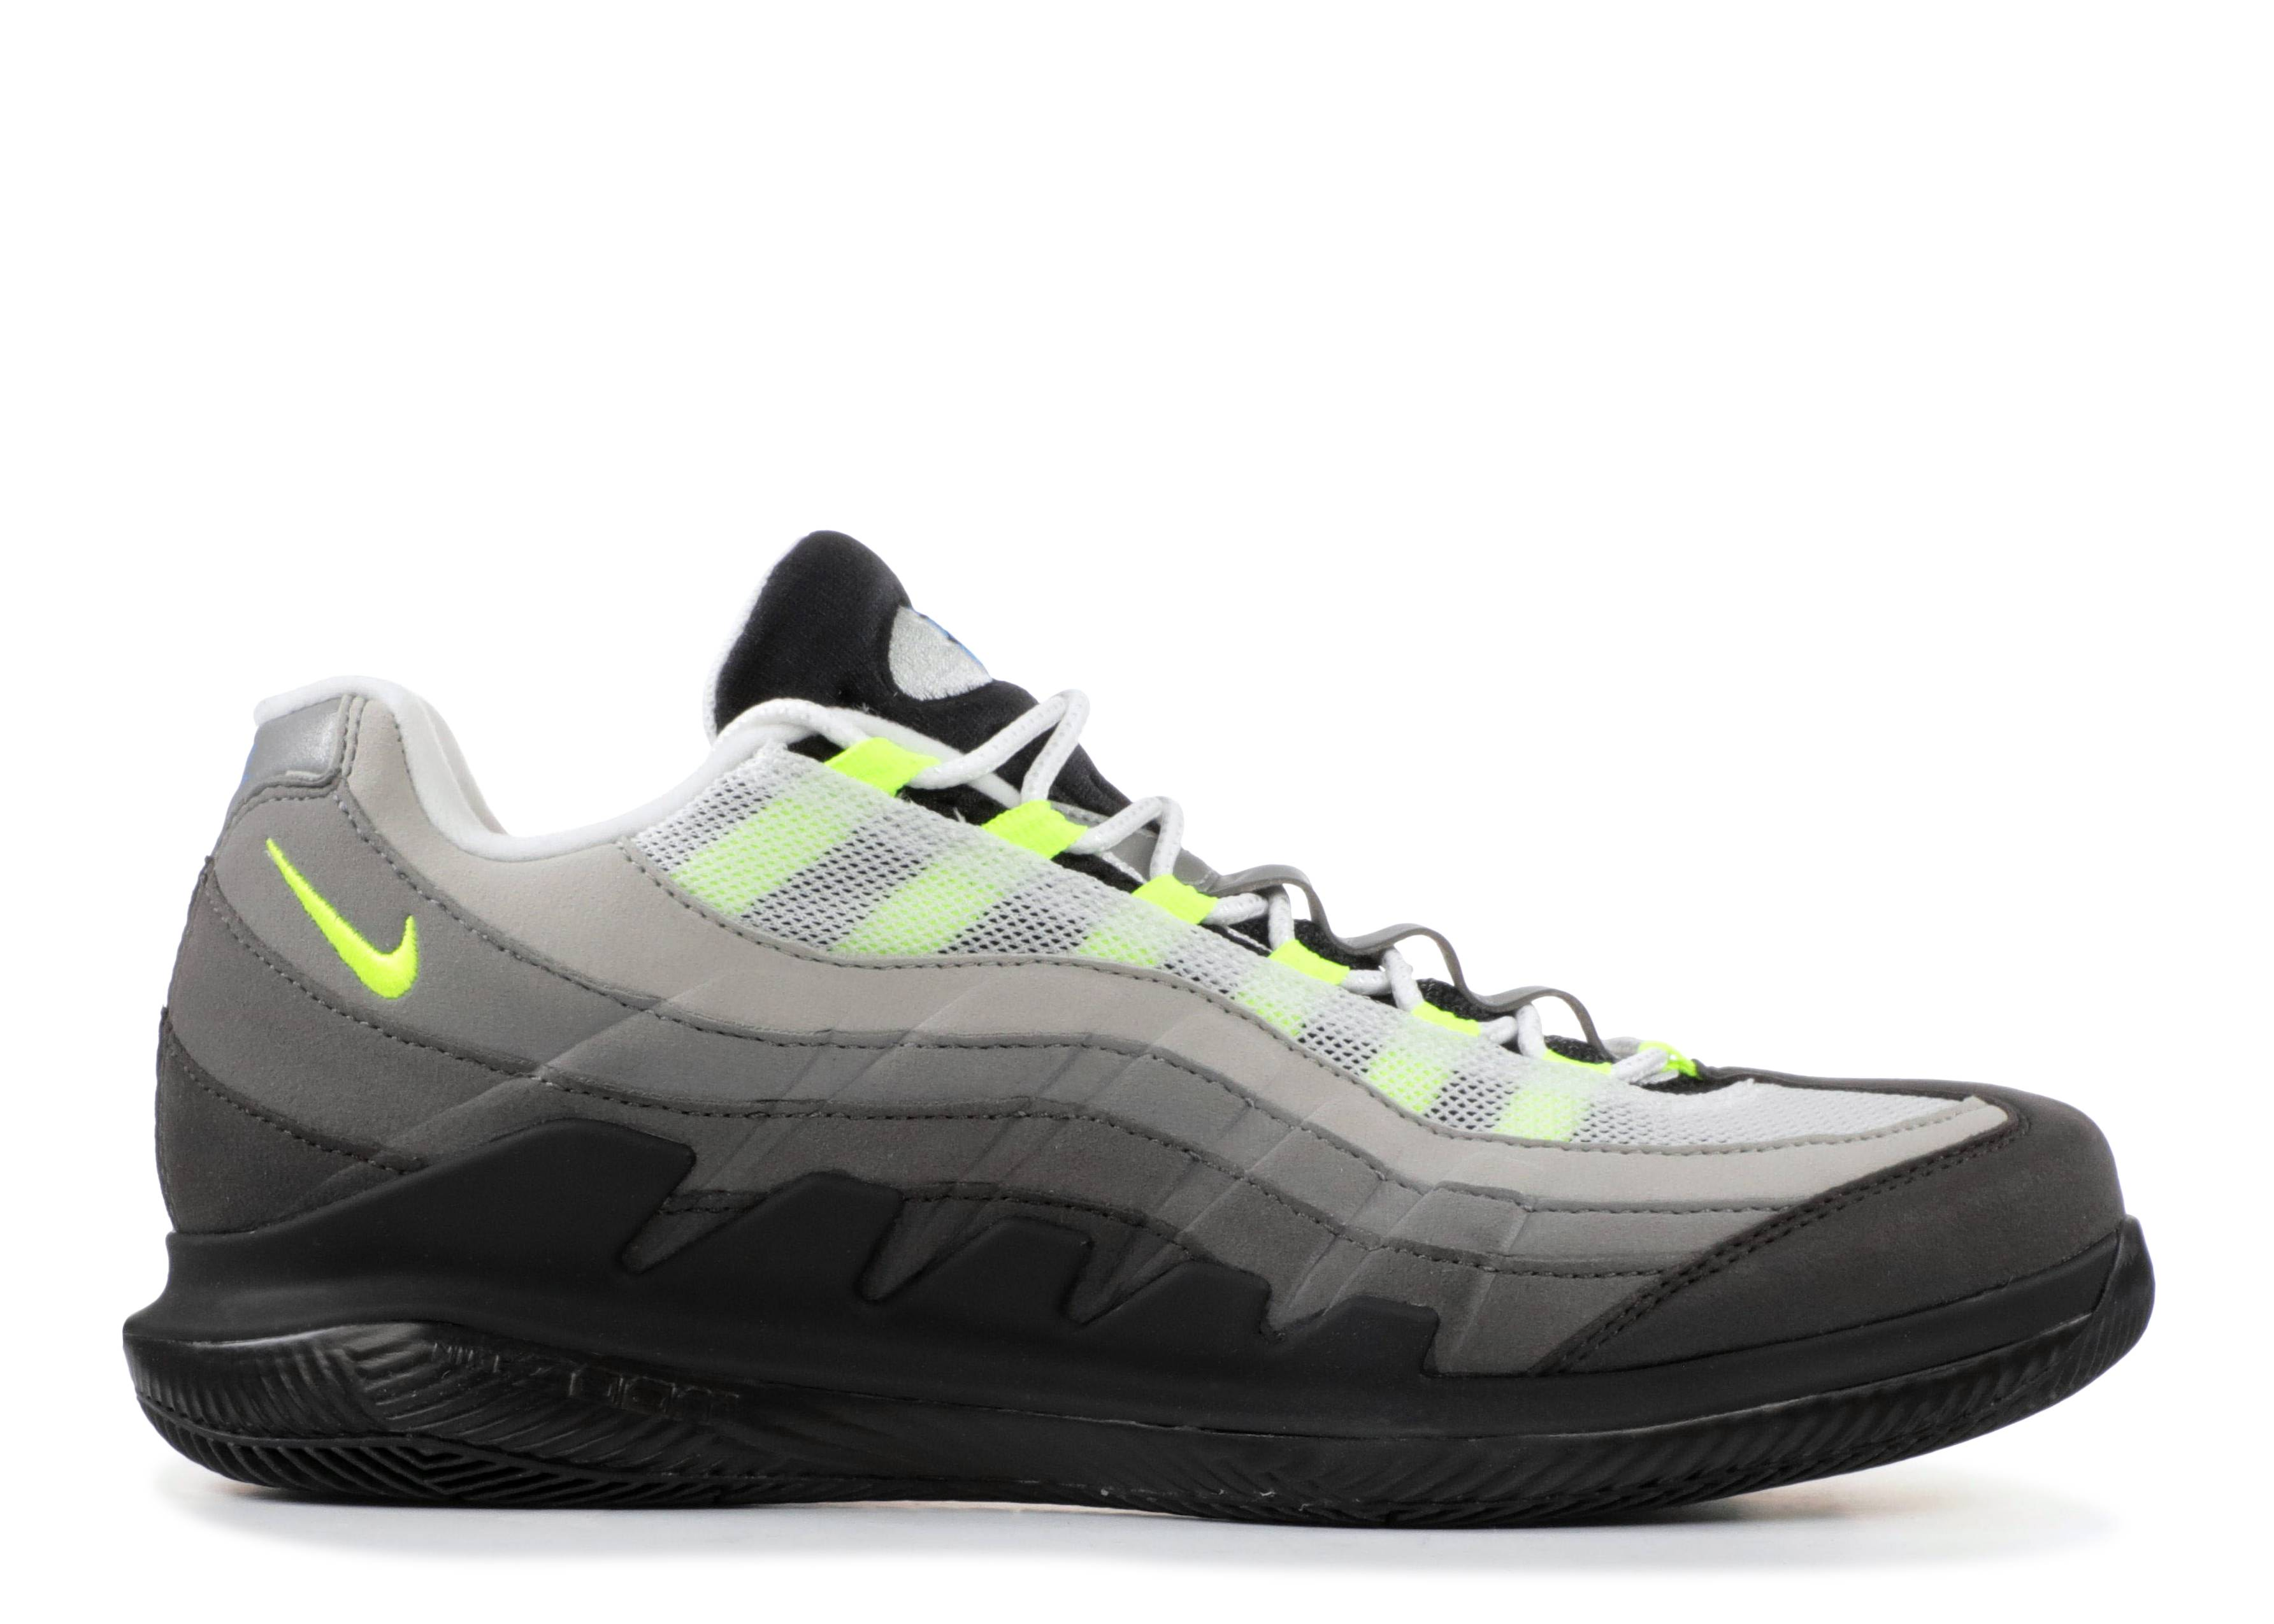 Nike Zoom Vapor RF x AM 95